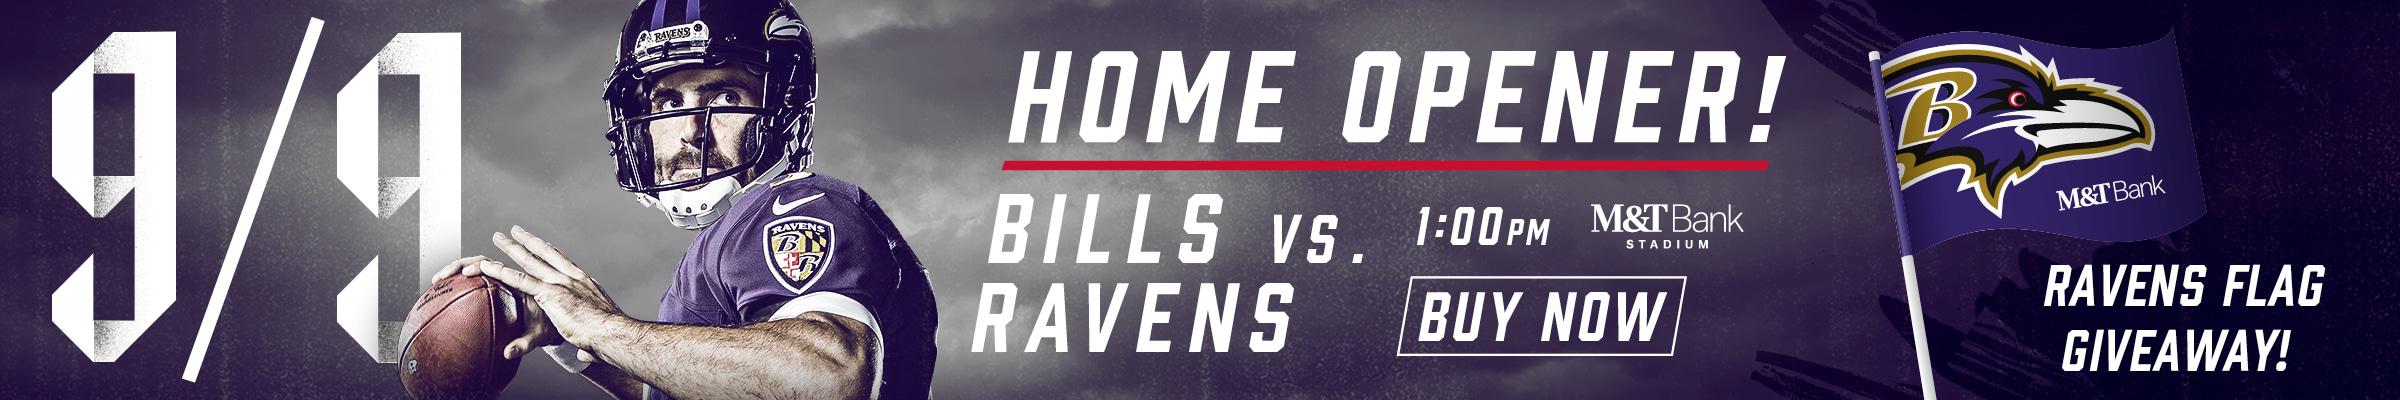 Baltimore Ravens | Home